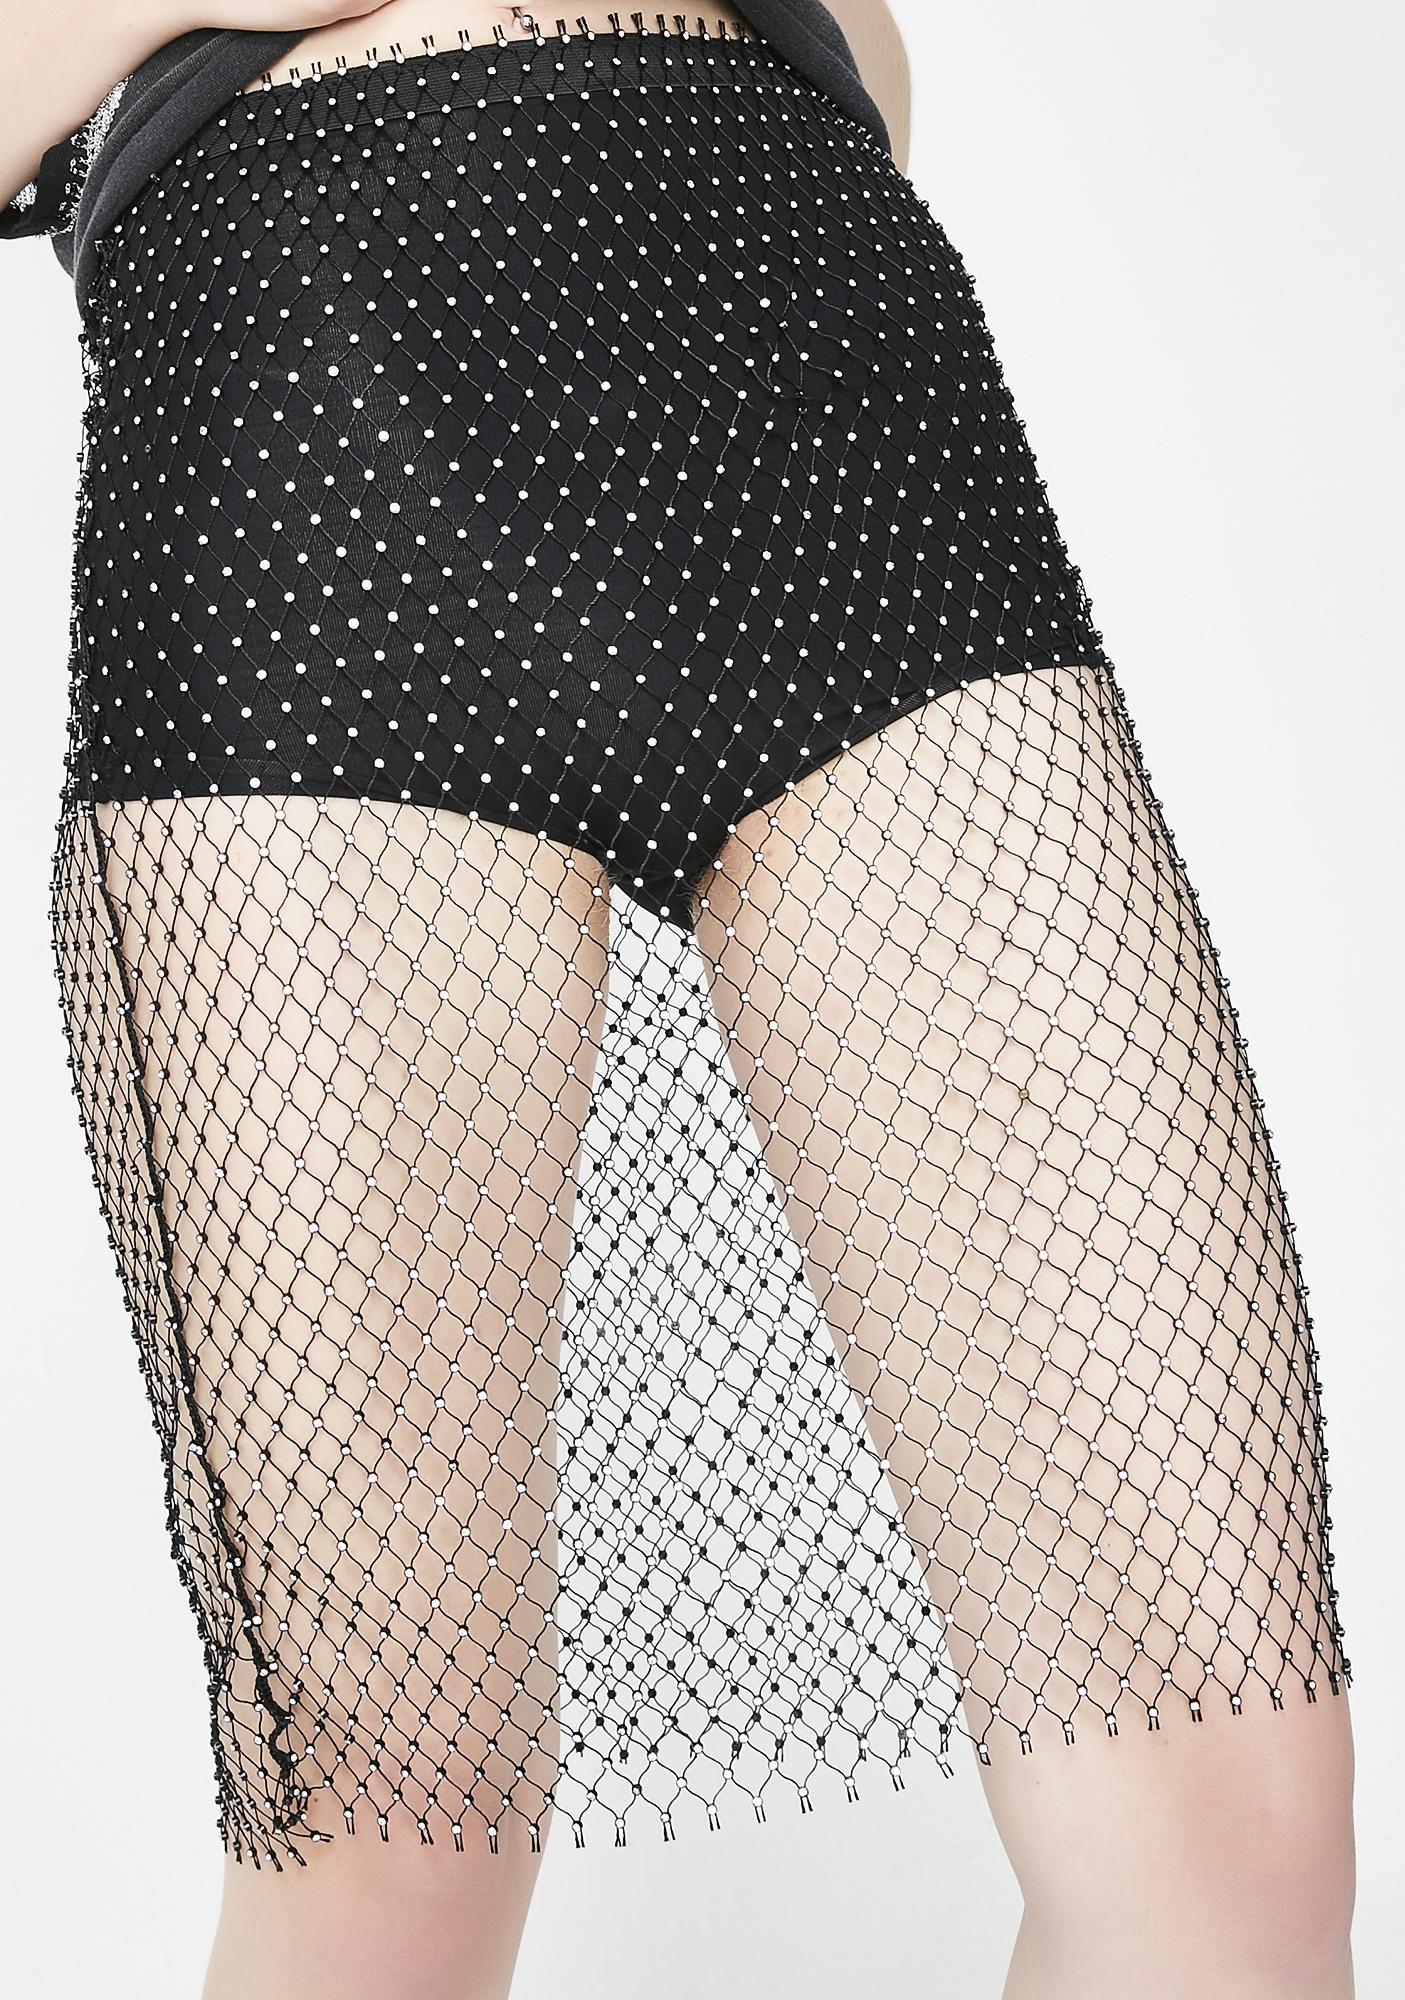 Kiki Riki Goth Bombshell Fishnet Skirt